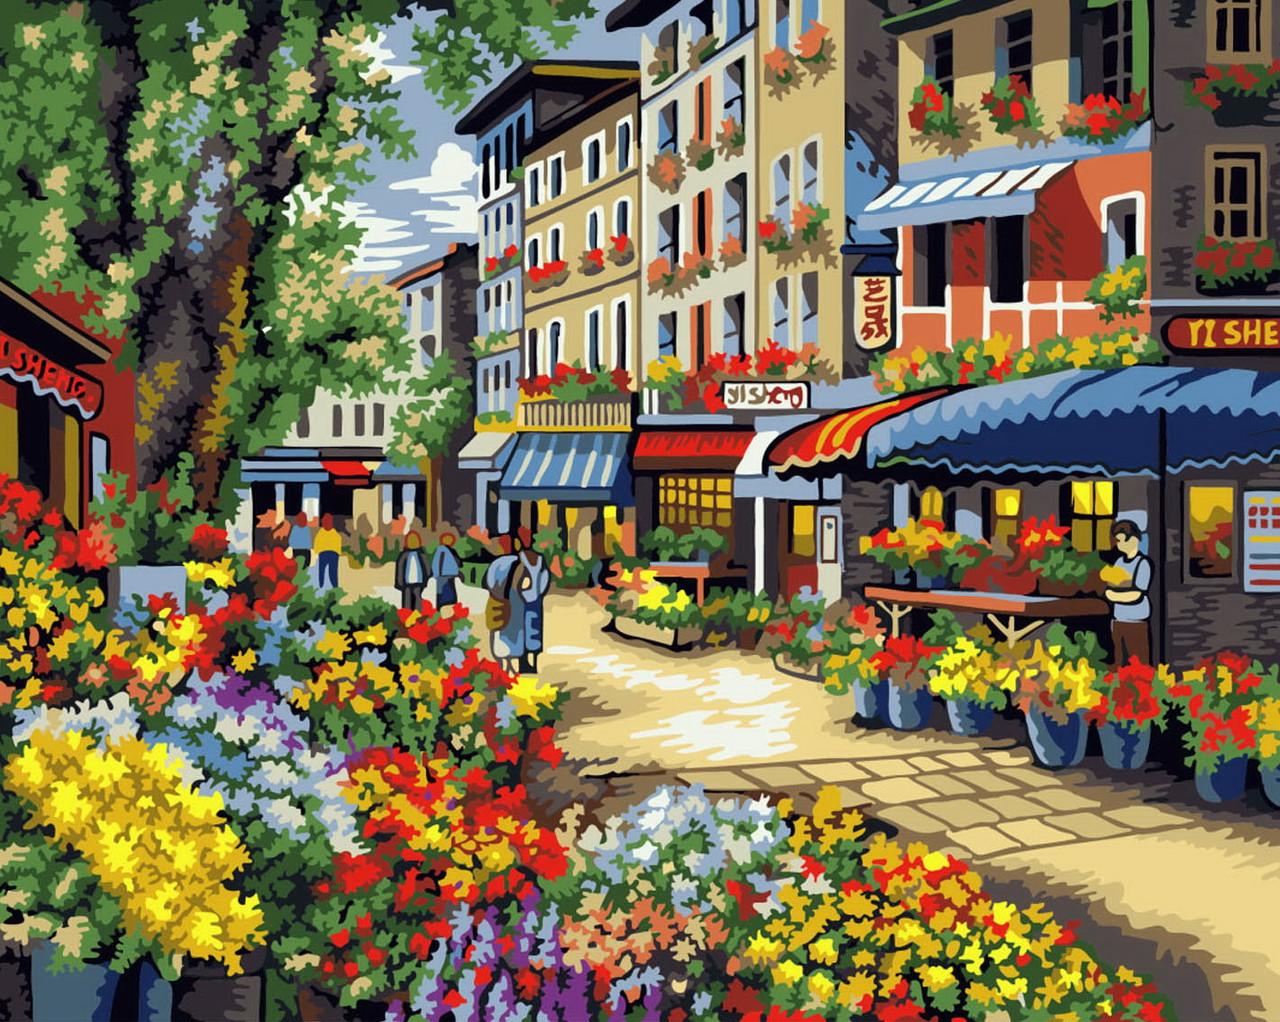 Картина по номерам Цветочная лавка, 40x50 см., Brushme